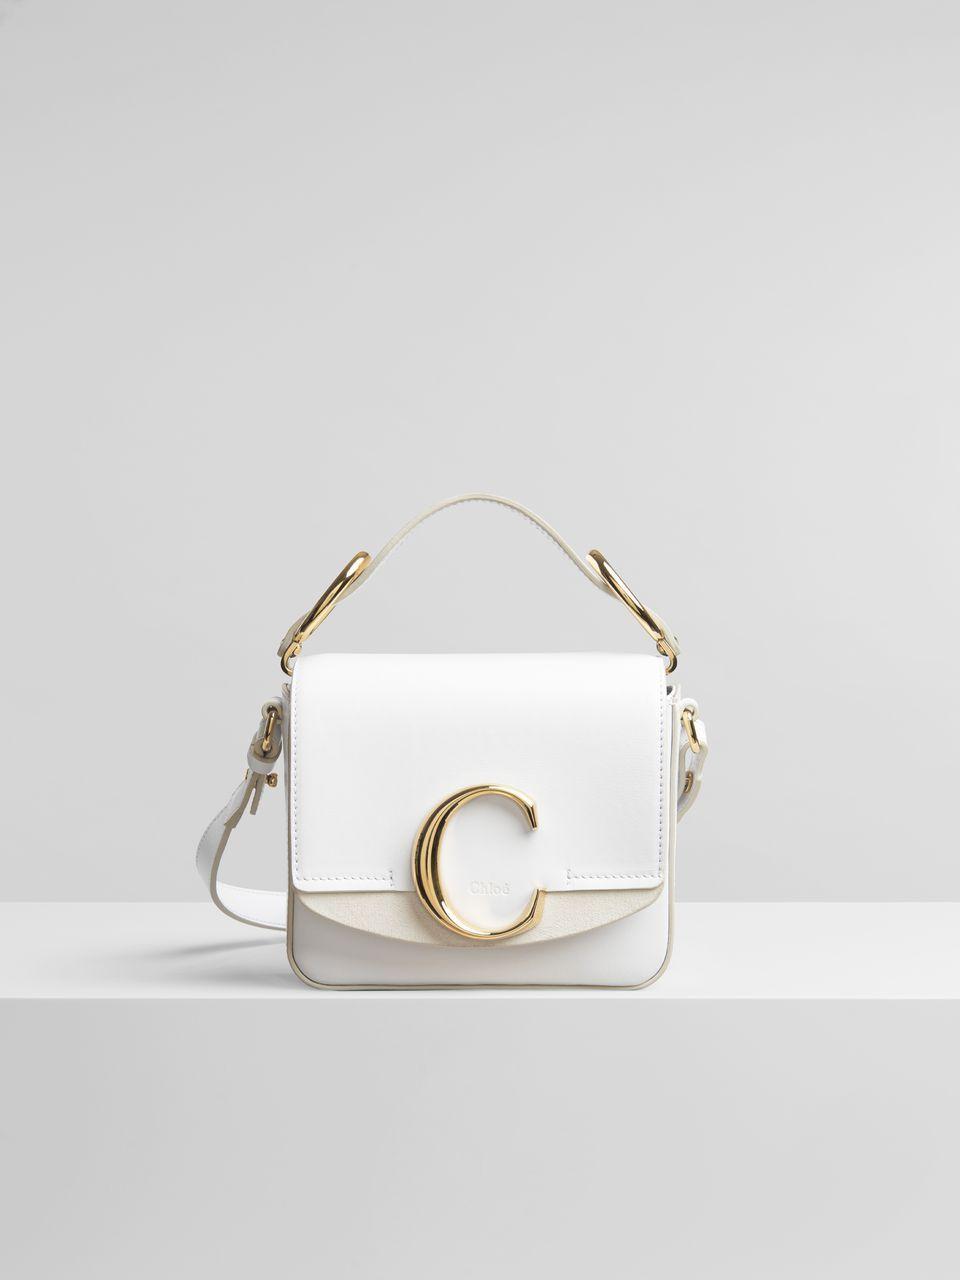 66c4824eba6 Chloé - Mini Chloé C bag in white shiny   suede calfskin ( 1